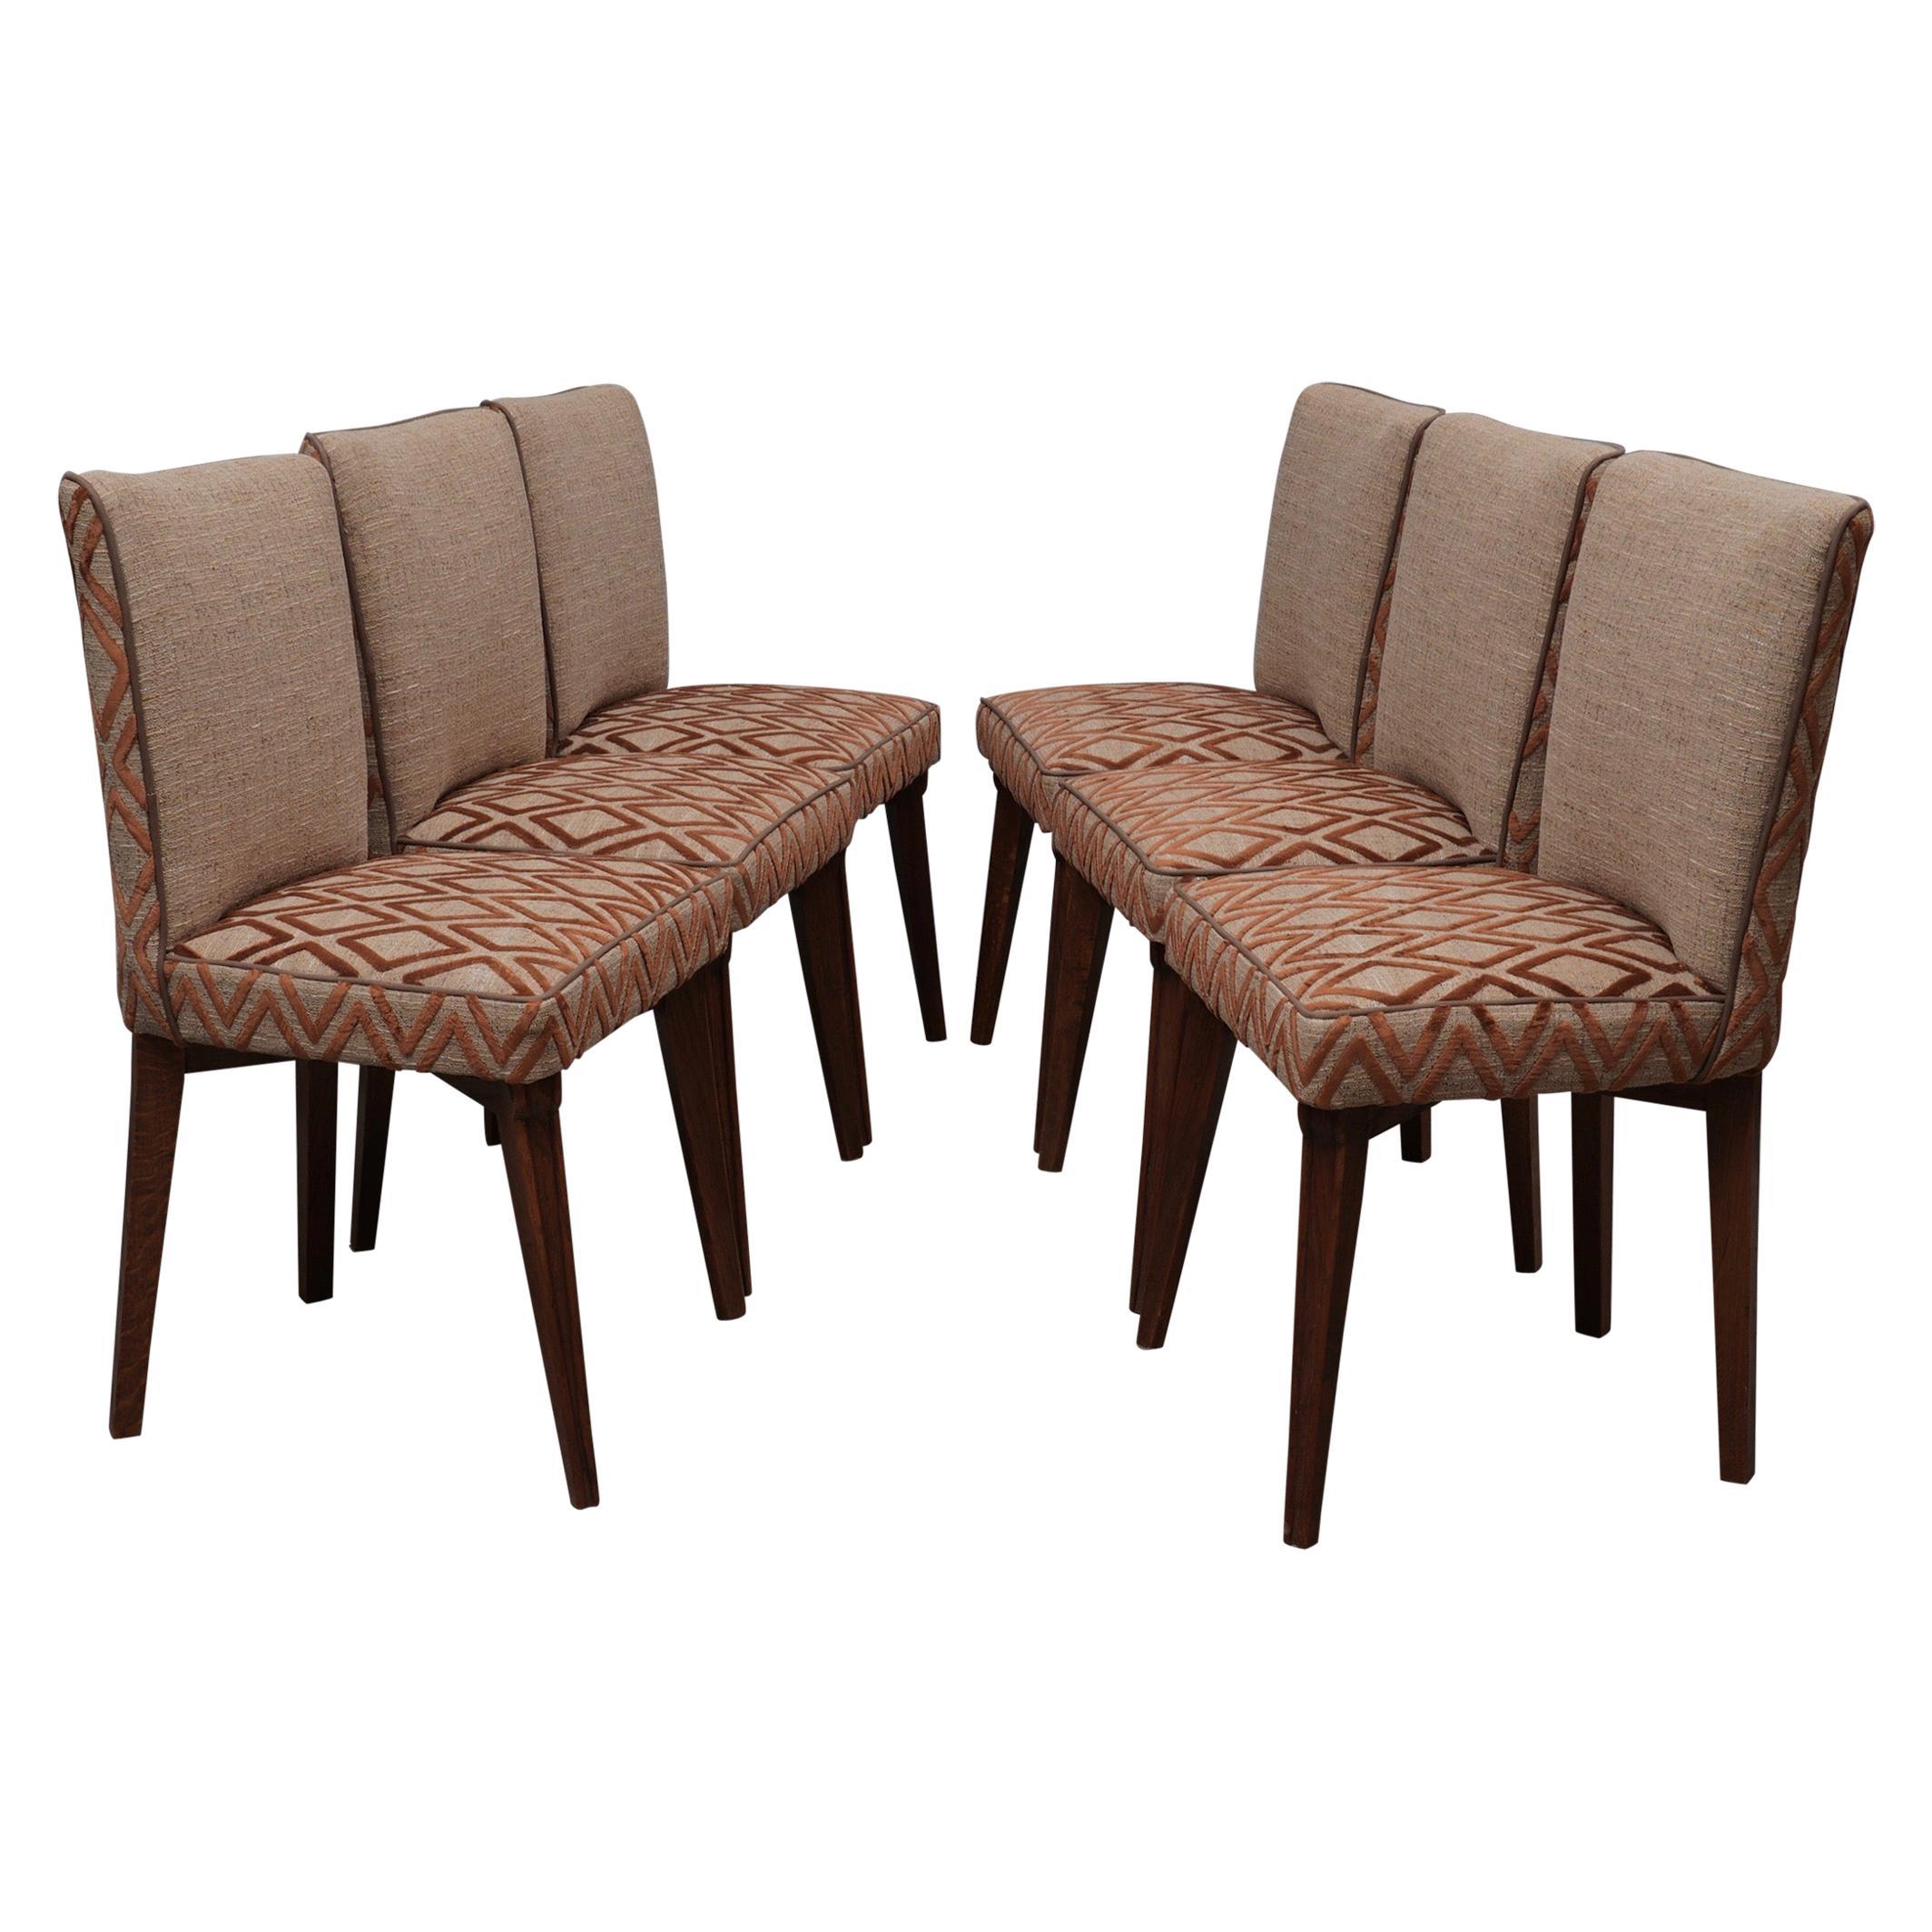 6 Pierluigi Colli Ash Wood and Fabric Italian Chairs, 1950